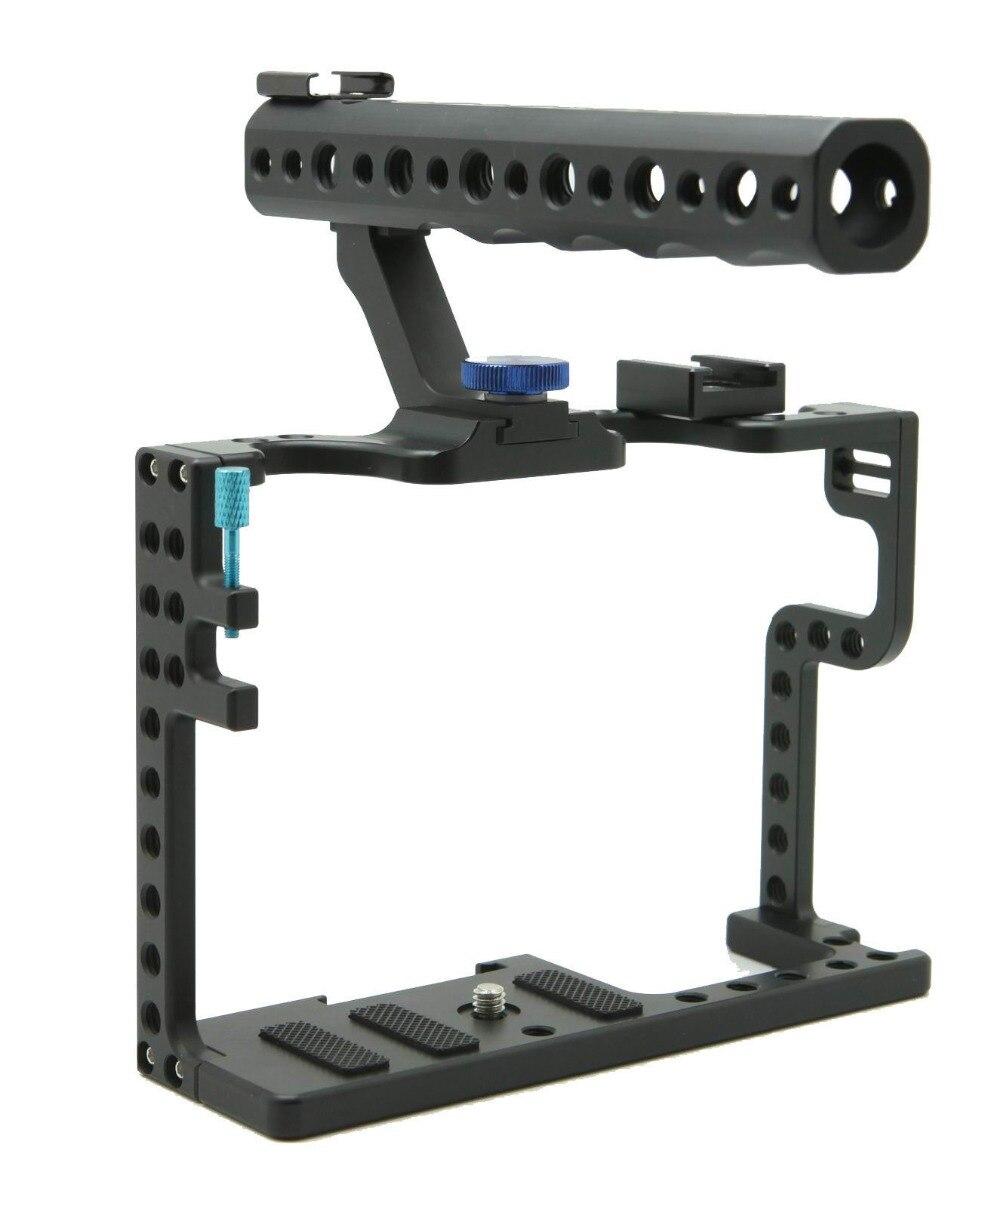 цена на DSLR Camera Cage With Top Handle Grip For Panasonic Lumix GH5 Camera Rig F20577